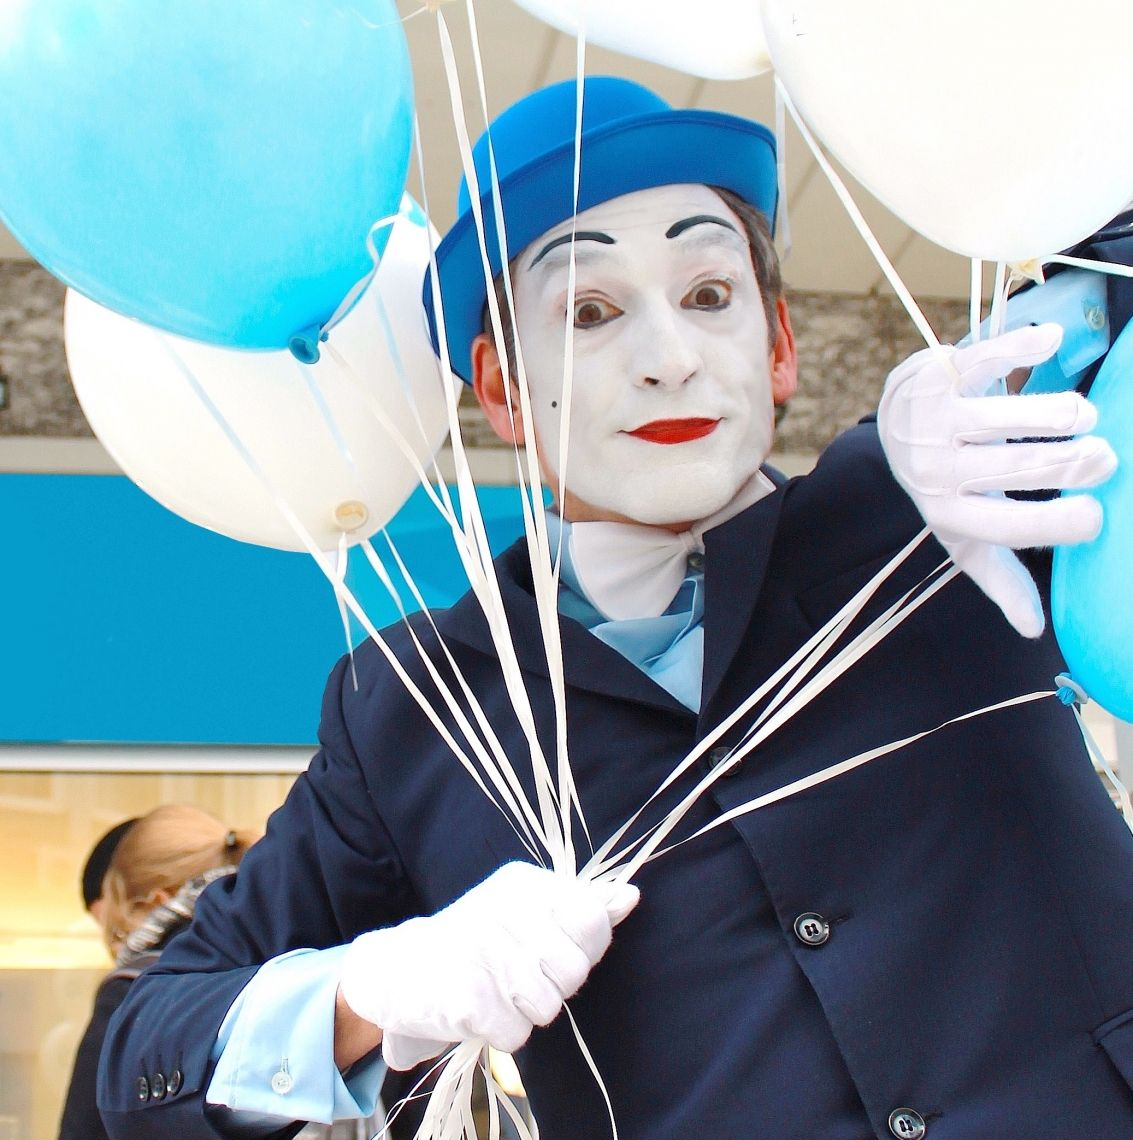 Pantomime Der Pantomimekünstler Alexander Simon aus Berlin